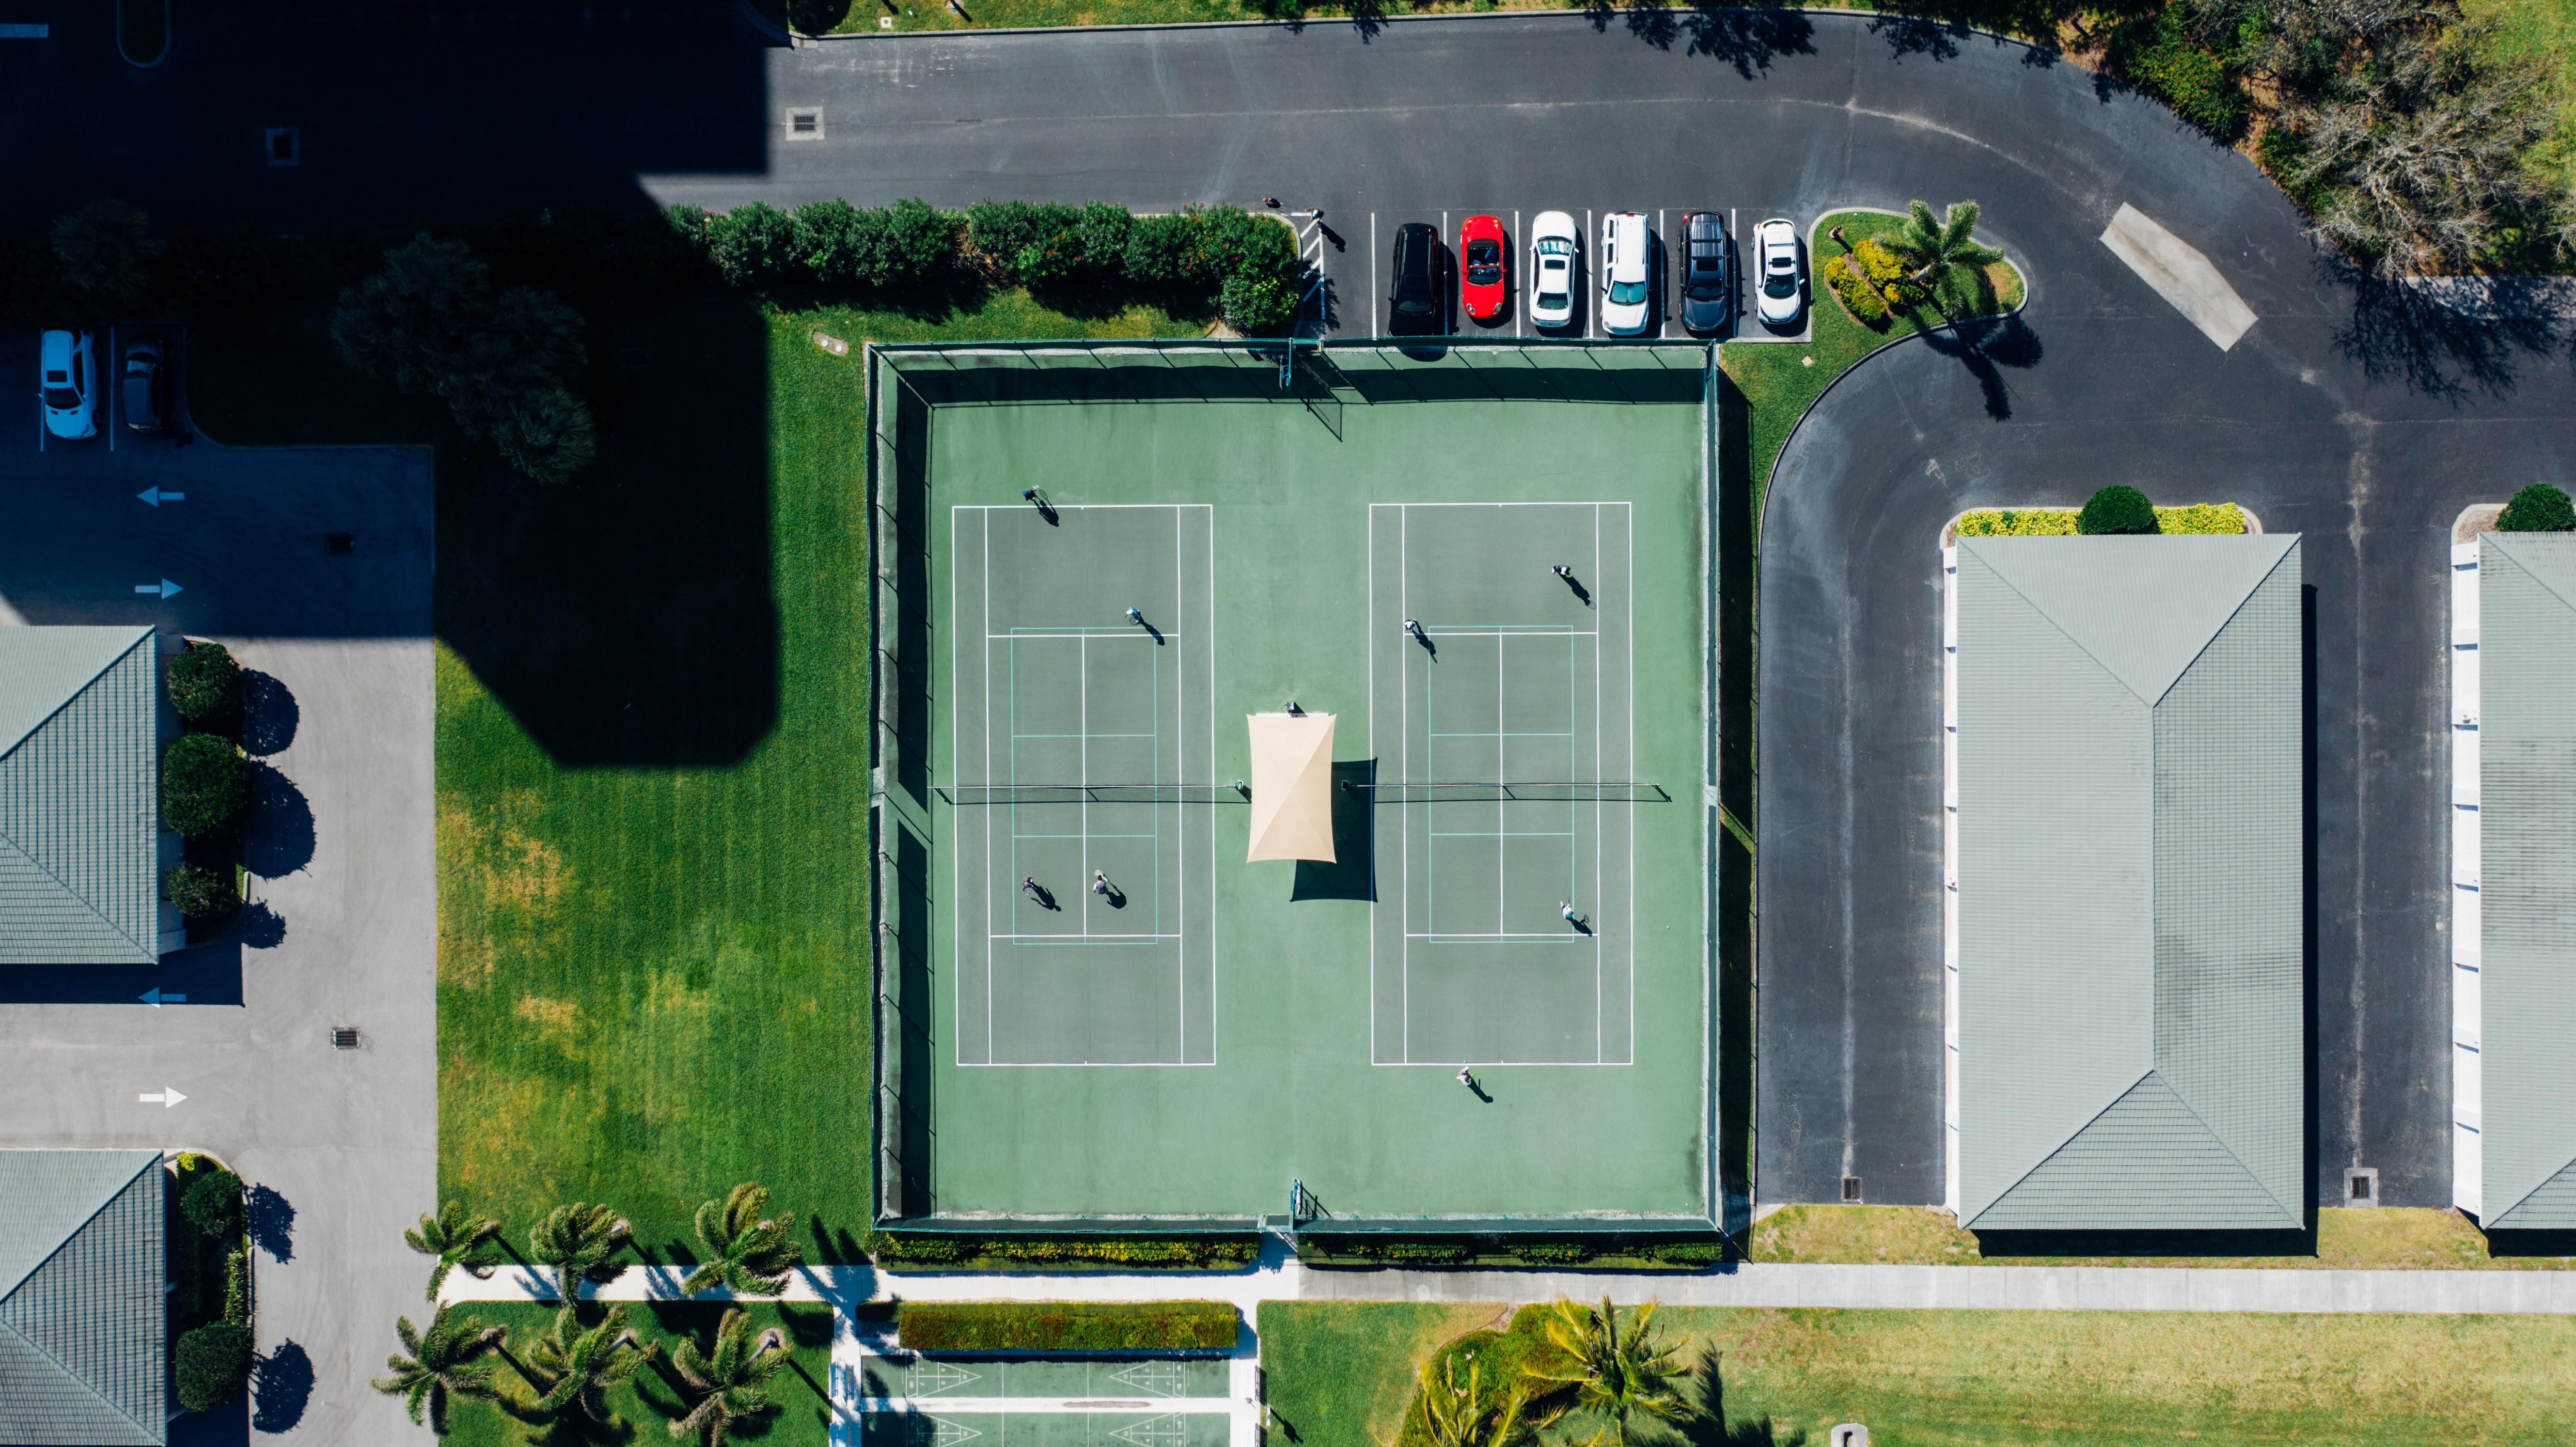 Overhead view of a tennis club